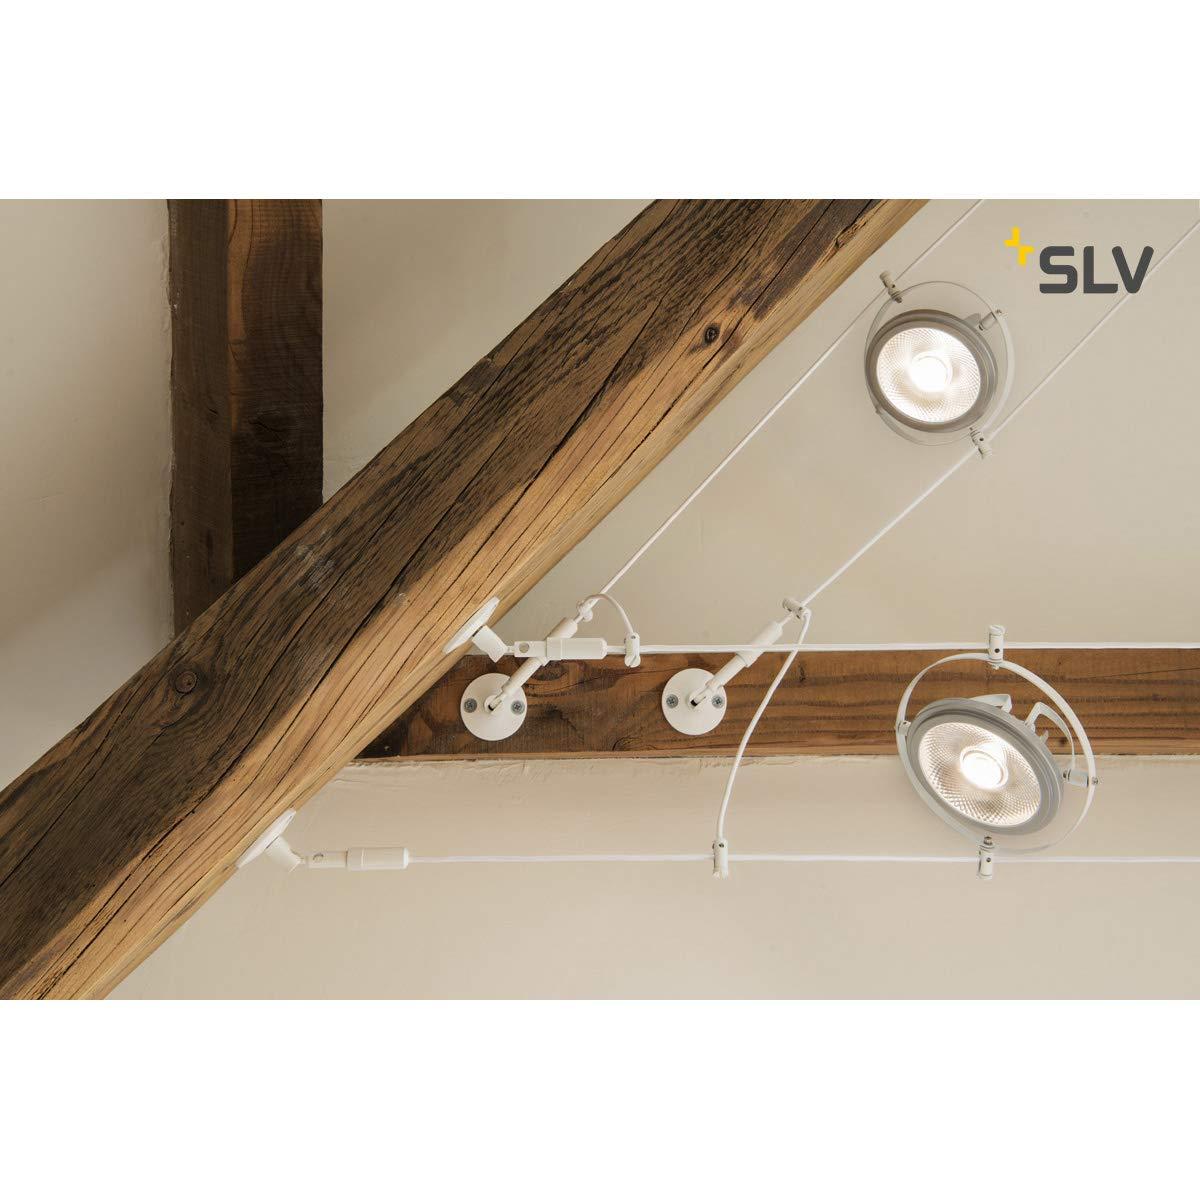 flexibel Stahl//Aluminium Schwarz SLV WANDHALTER Wand//Deckenhalter